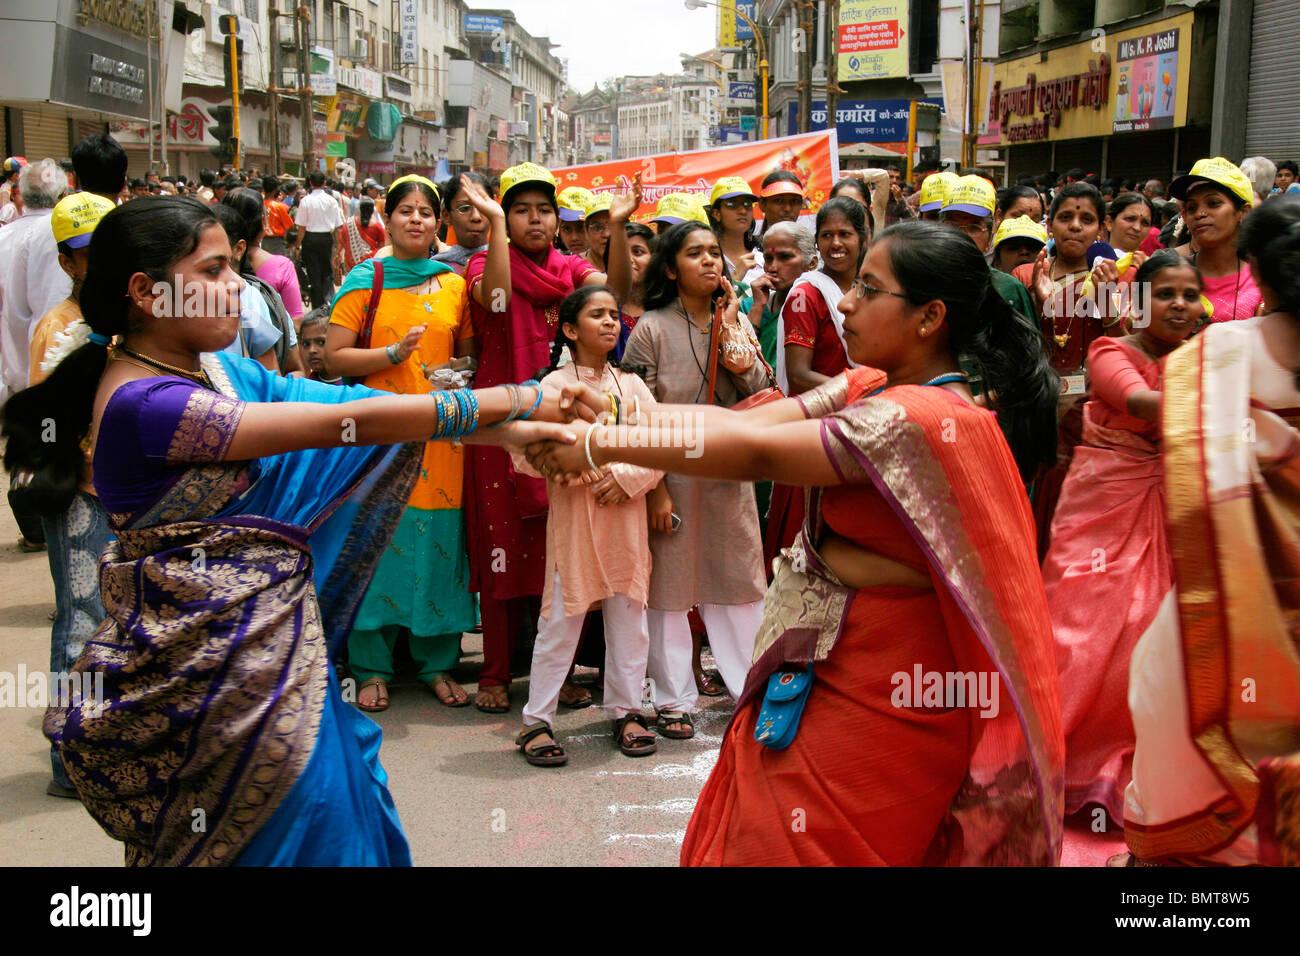 Celebrations during the immersion festival of lord Ganesh ganpati  elephant headed god NO MR ; Pune ; Maharashtra - Stock Image